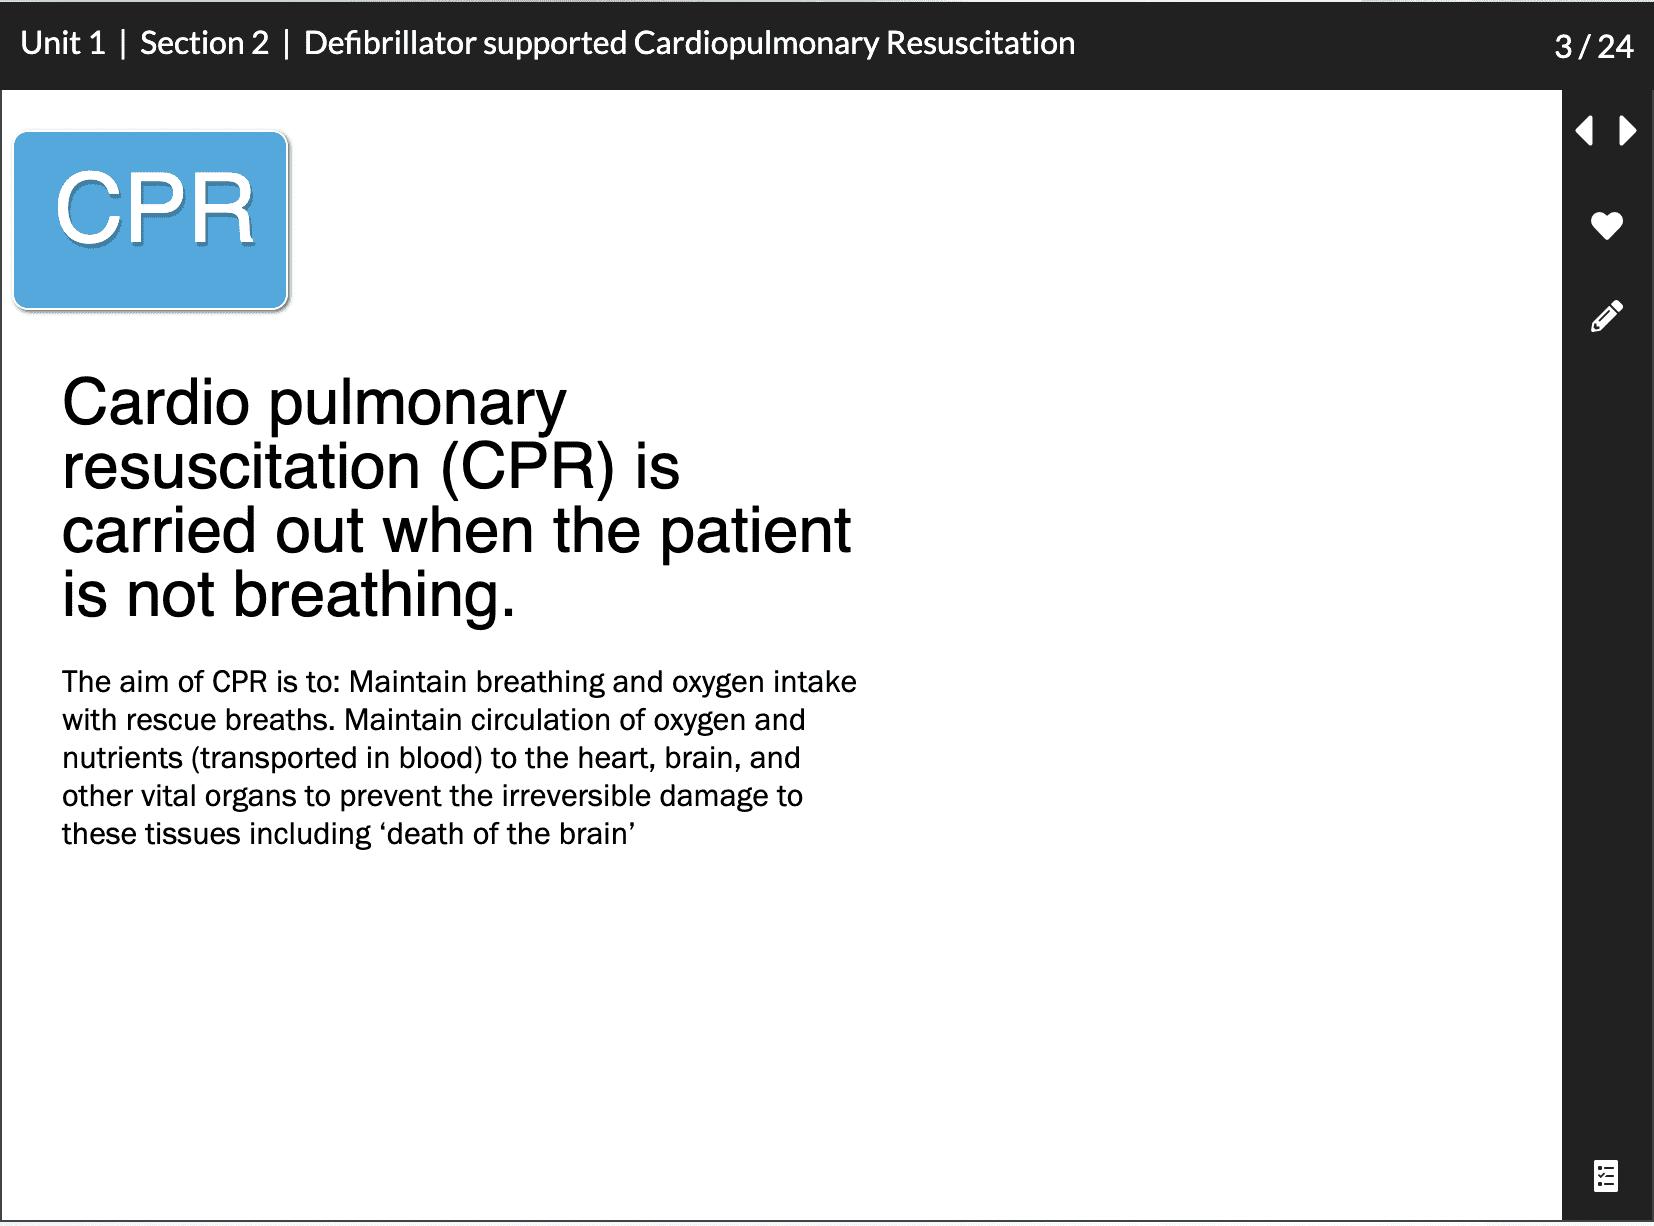 Defibrillator supported Cardiopulmonary Resuscitation